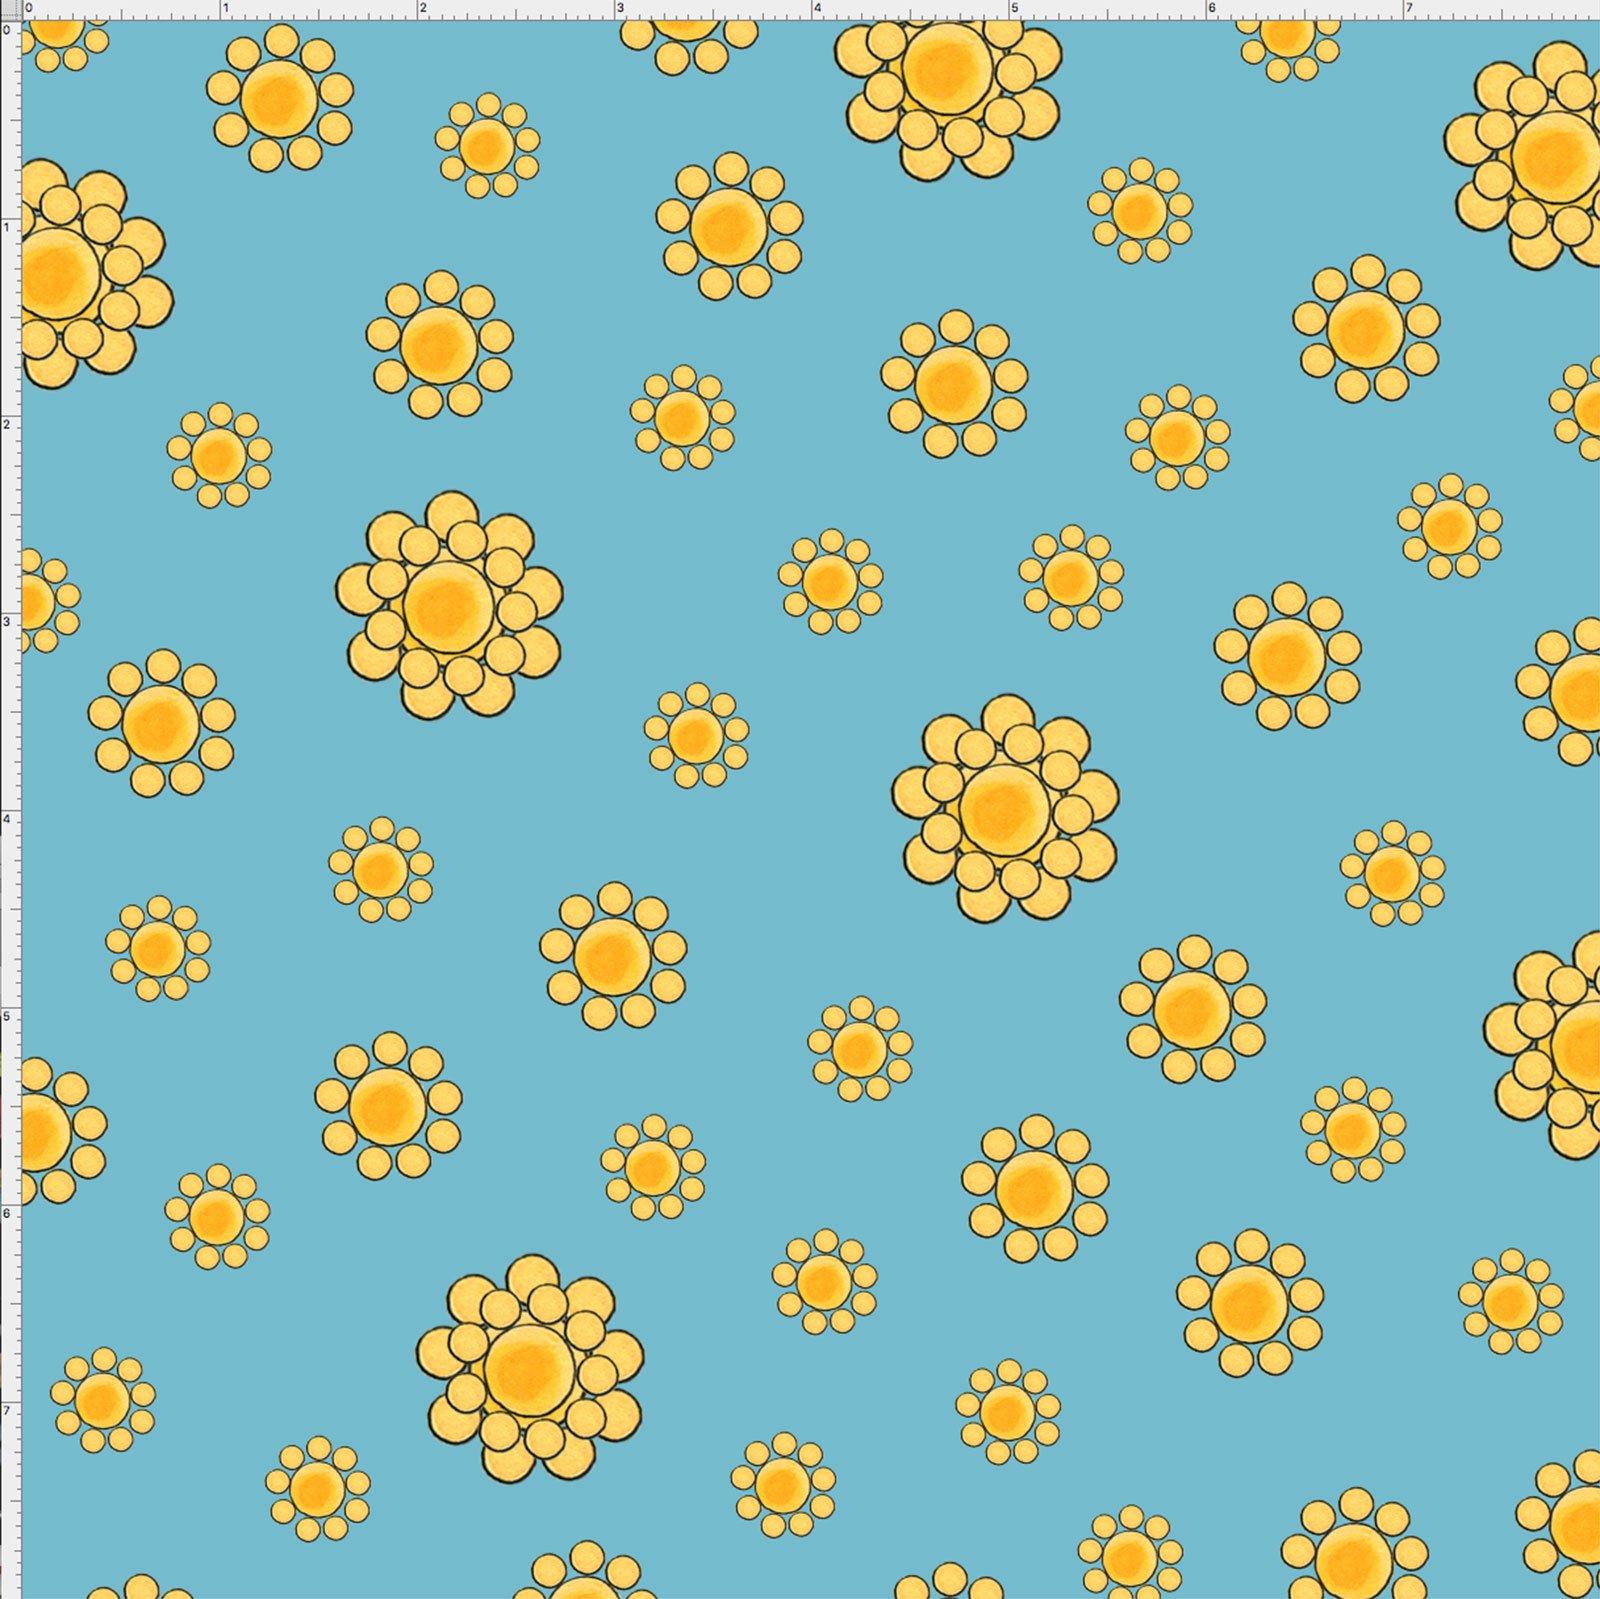 【Loralie Designs】- Bandana Dots Turquoise(ターコイズ) Fabric -(ULH-179)